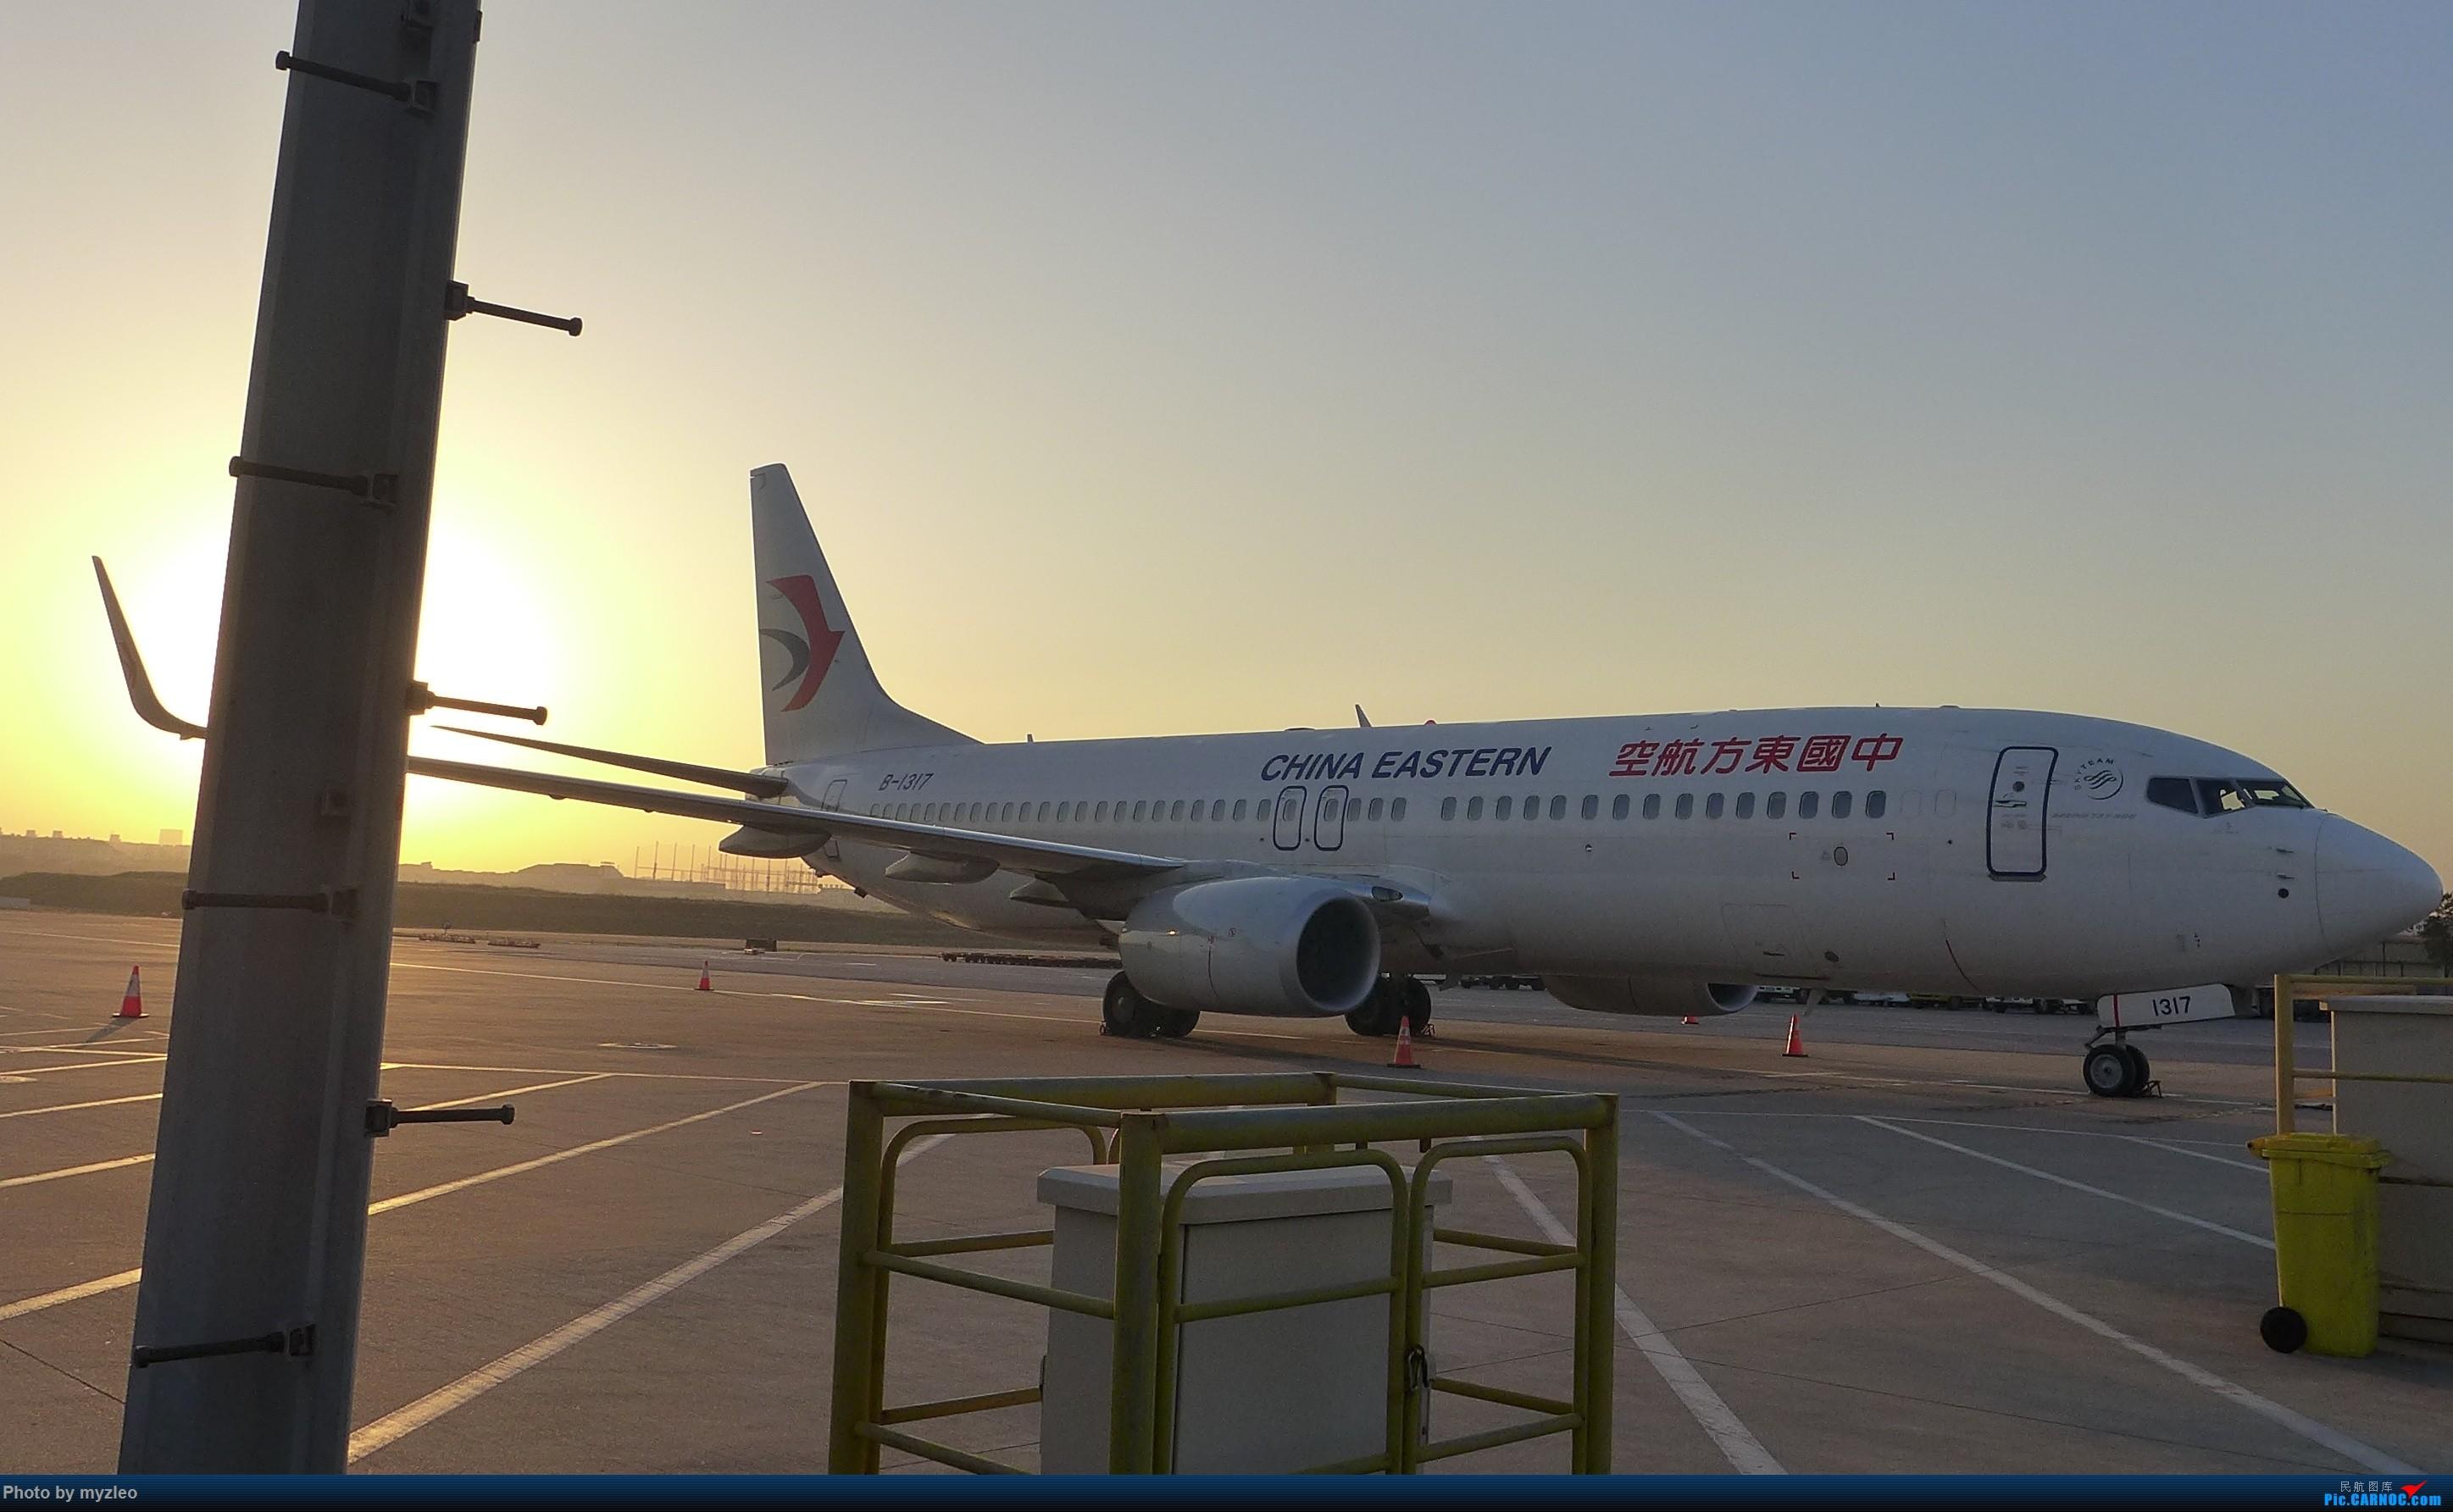 Re:[原创]【myzleo的游记1】六天五晚广州行——SHA-CAN上航商务舱初体验+广州城内 BOEING 737-800 B-1317 中国上海虹桥国际机场